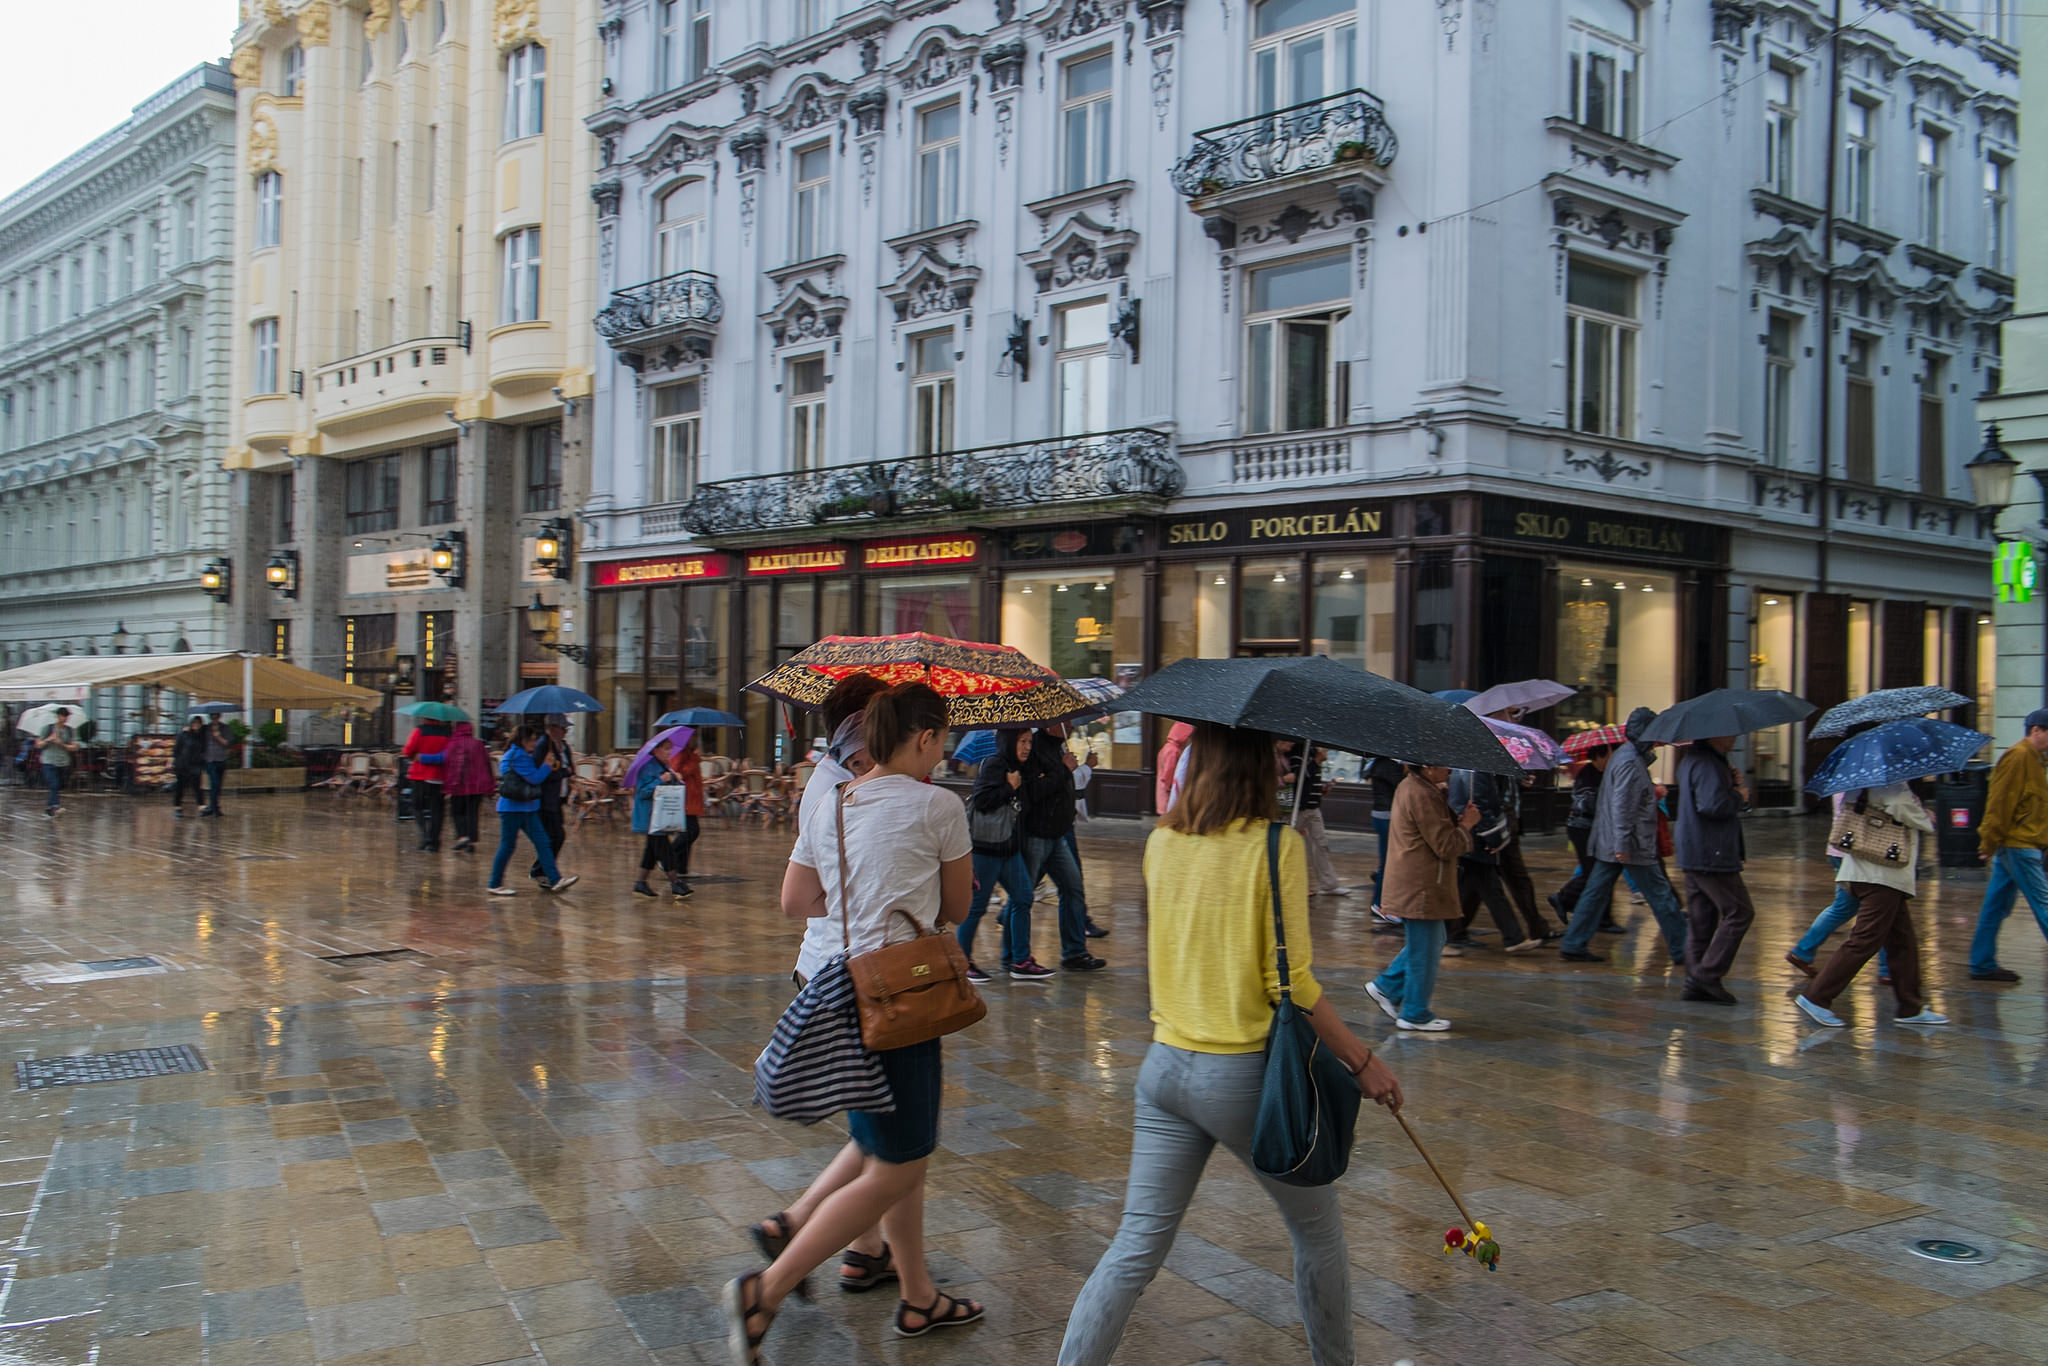 Keď neprší, ale leje – dôsledky zmeny klímy stratégiami nezvládneme